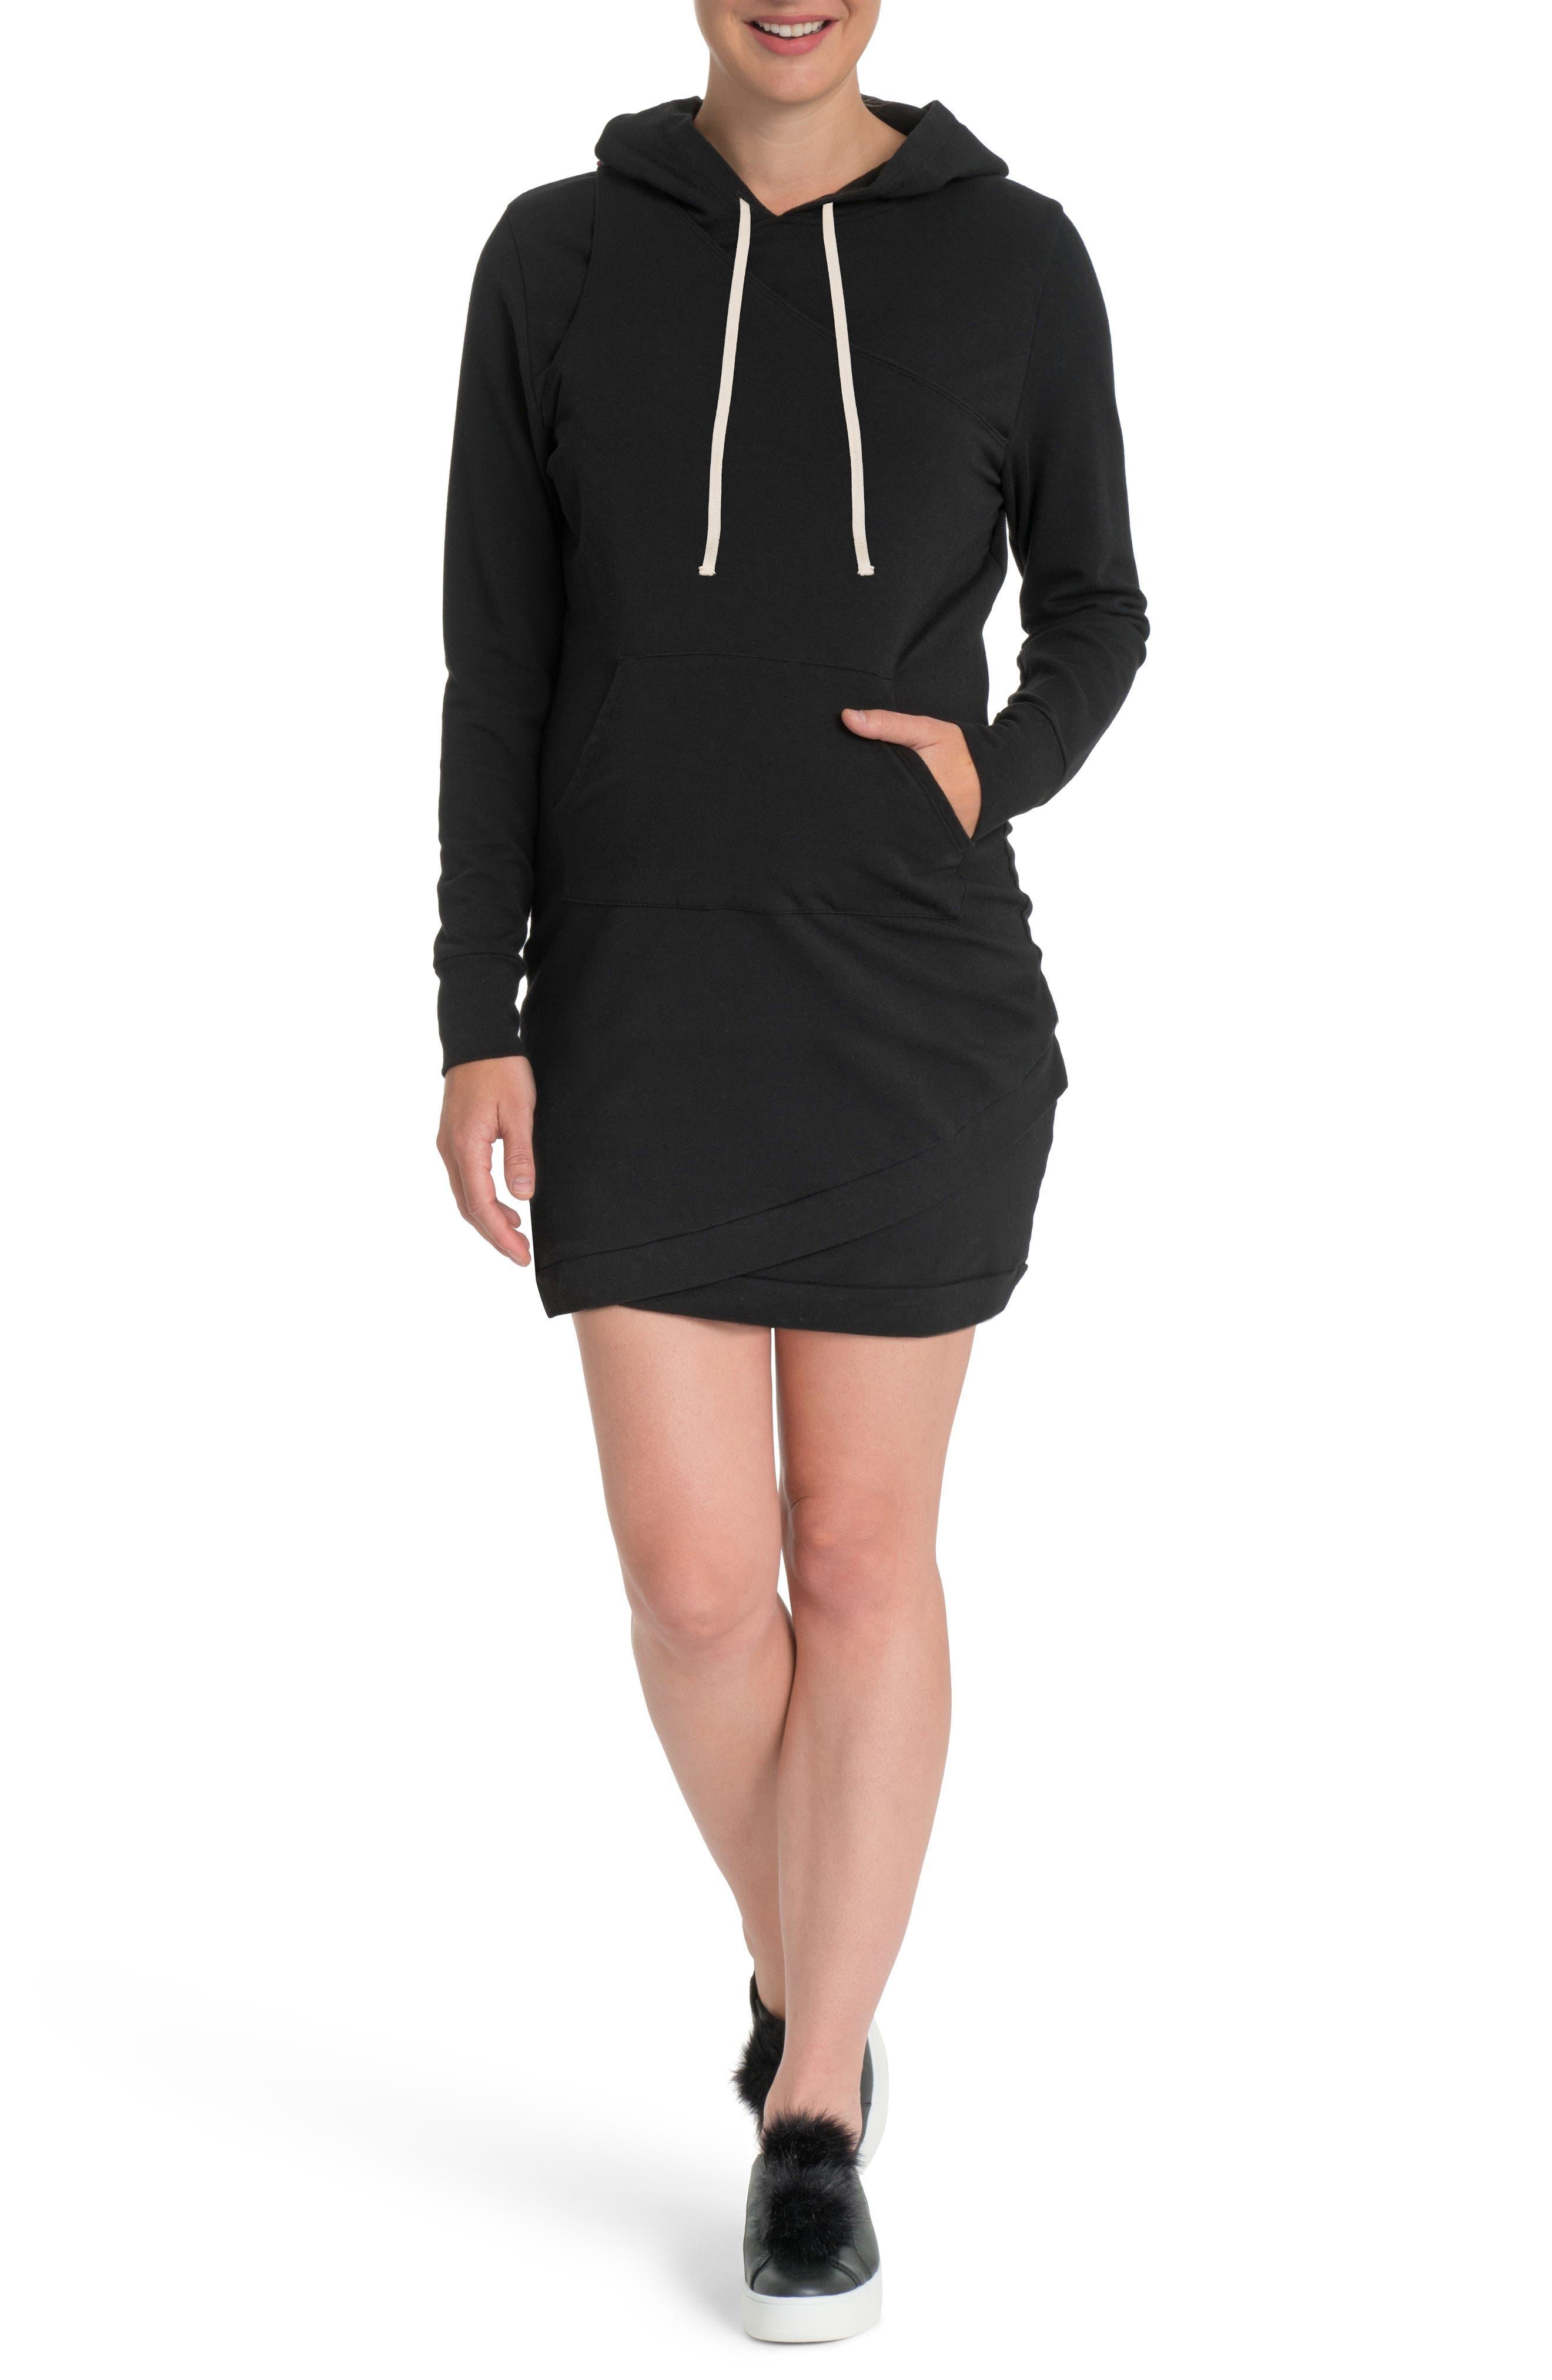 Cozy Maternity/Nursing Hooded Dress,                             Main thumbnail 1, color,                             002